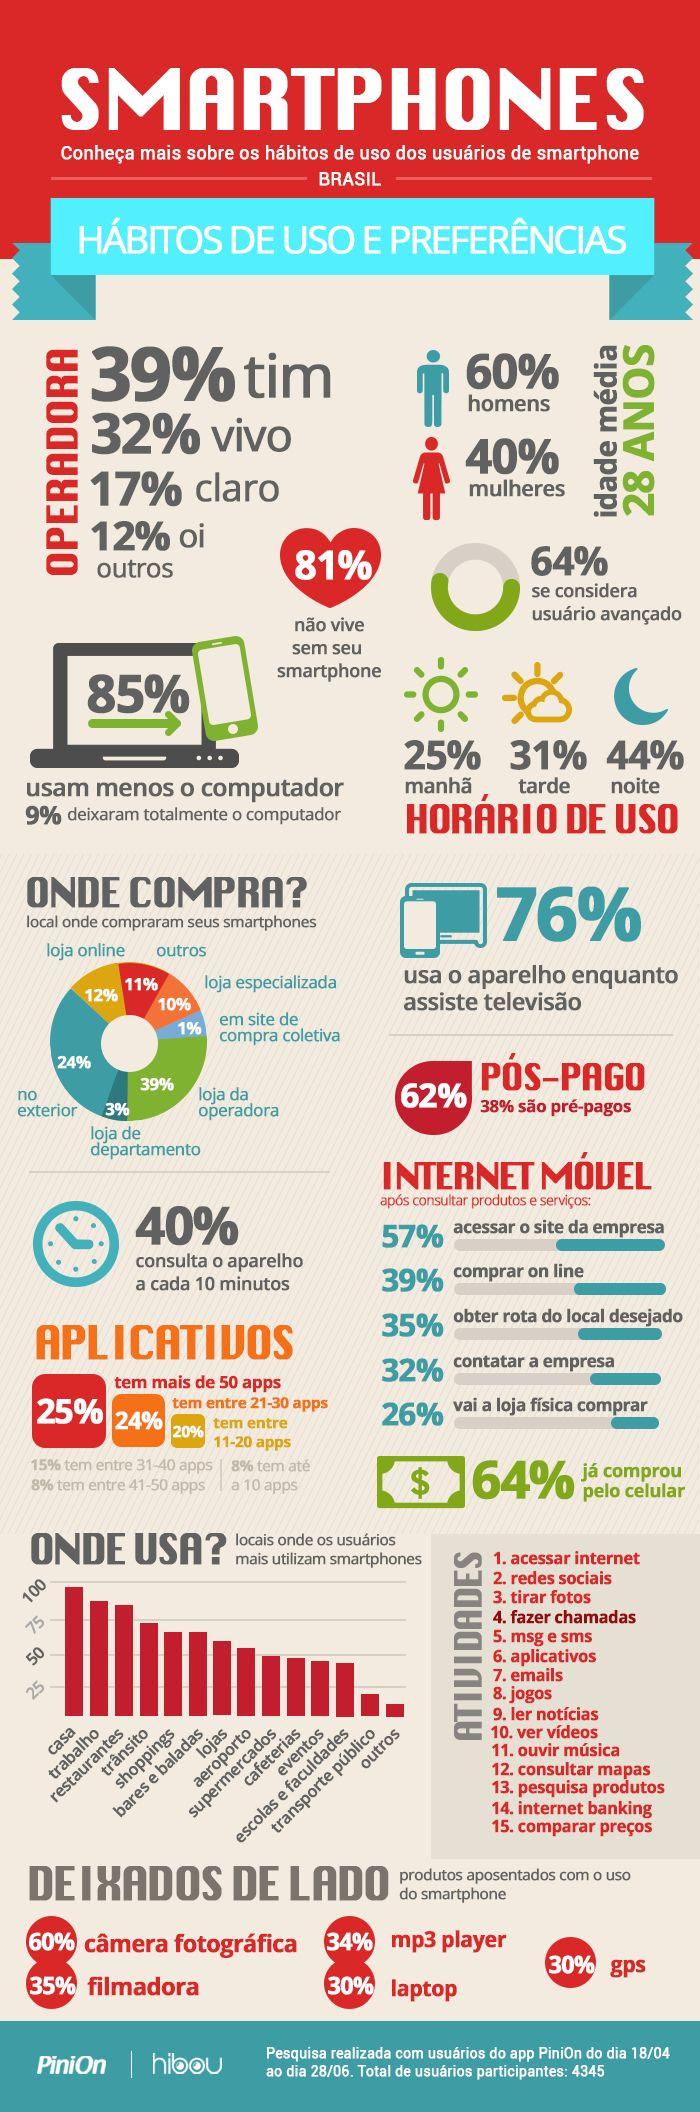 Infográfico: Uso do Smartphone no Brasil. #mobile